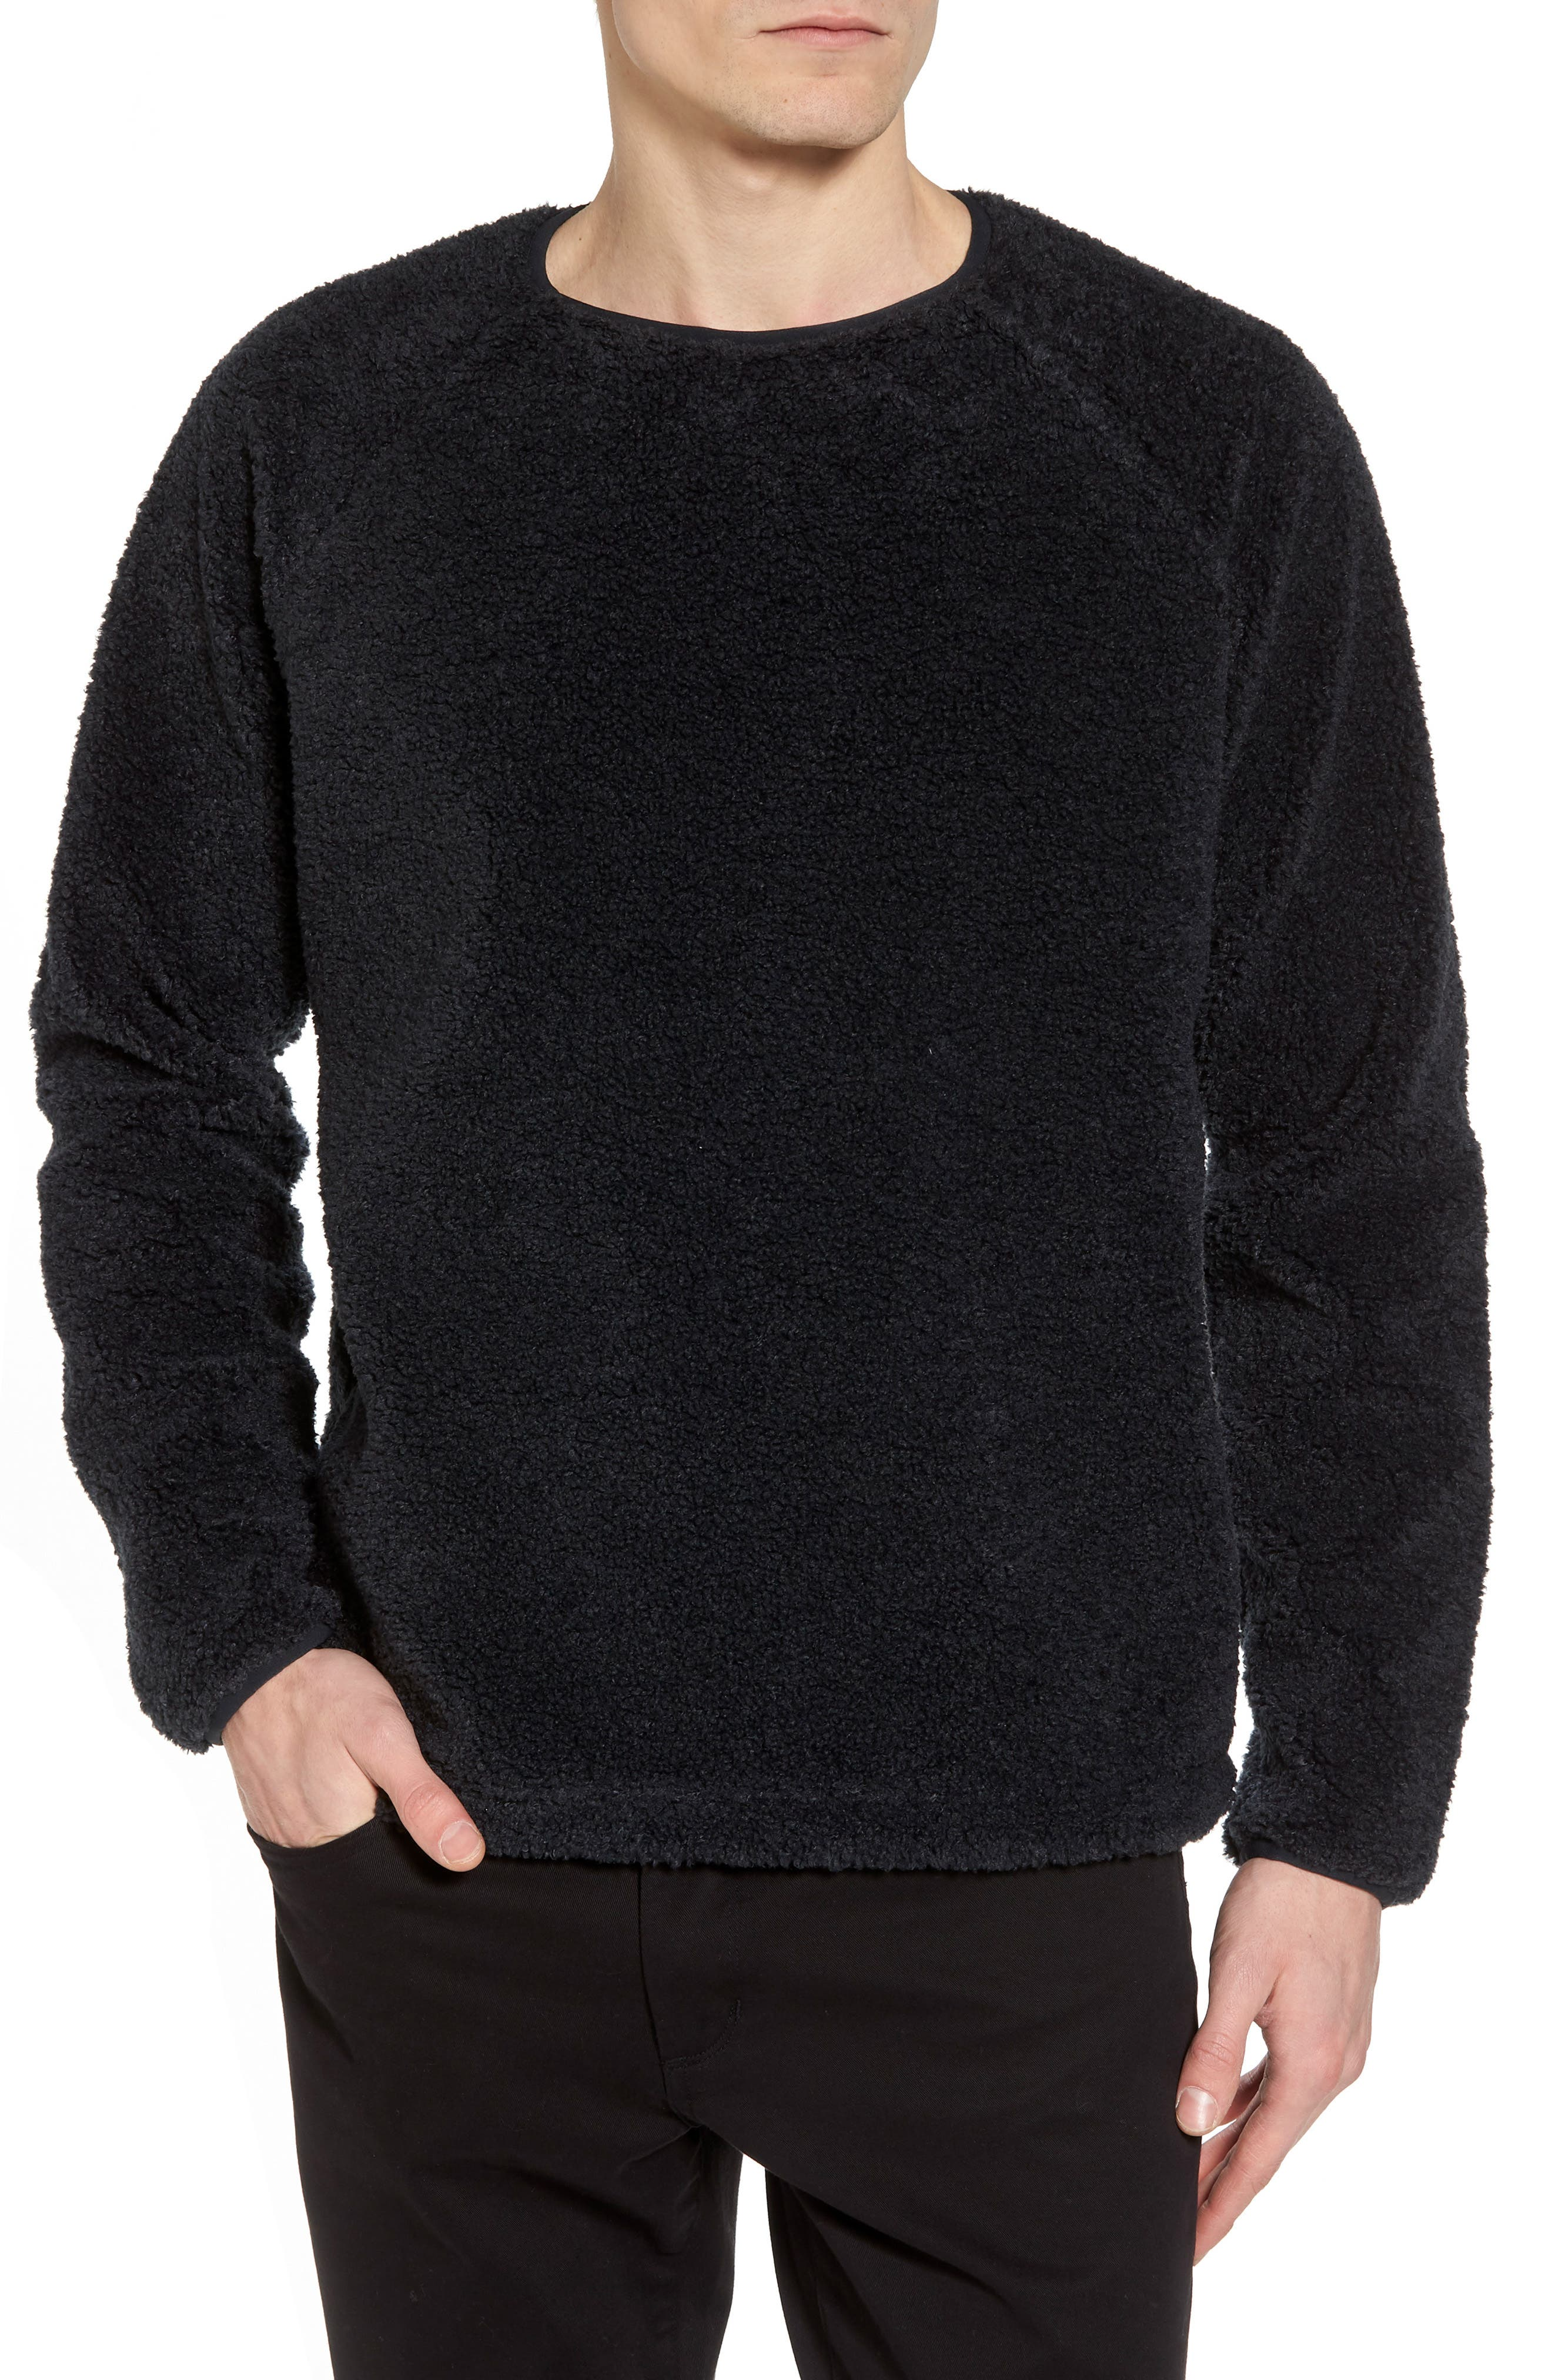 Deliverance Fleece Sweatshirt,                             Main thumbnail 1, color,